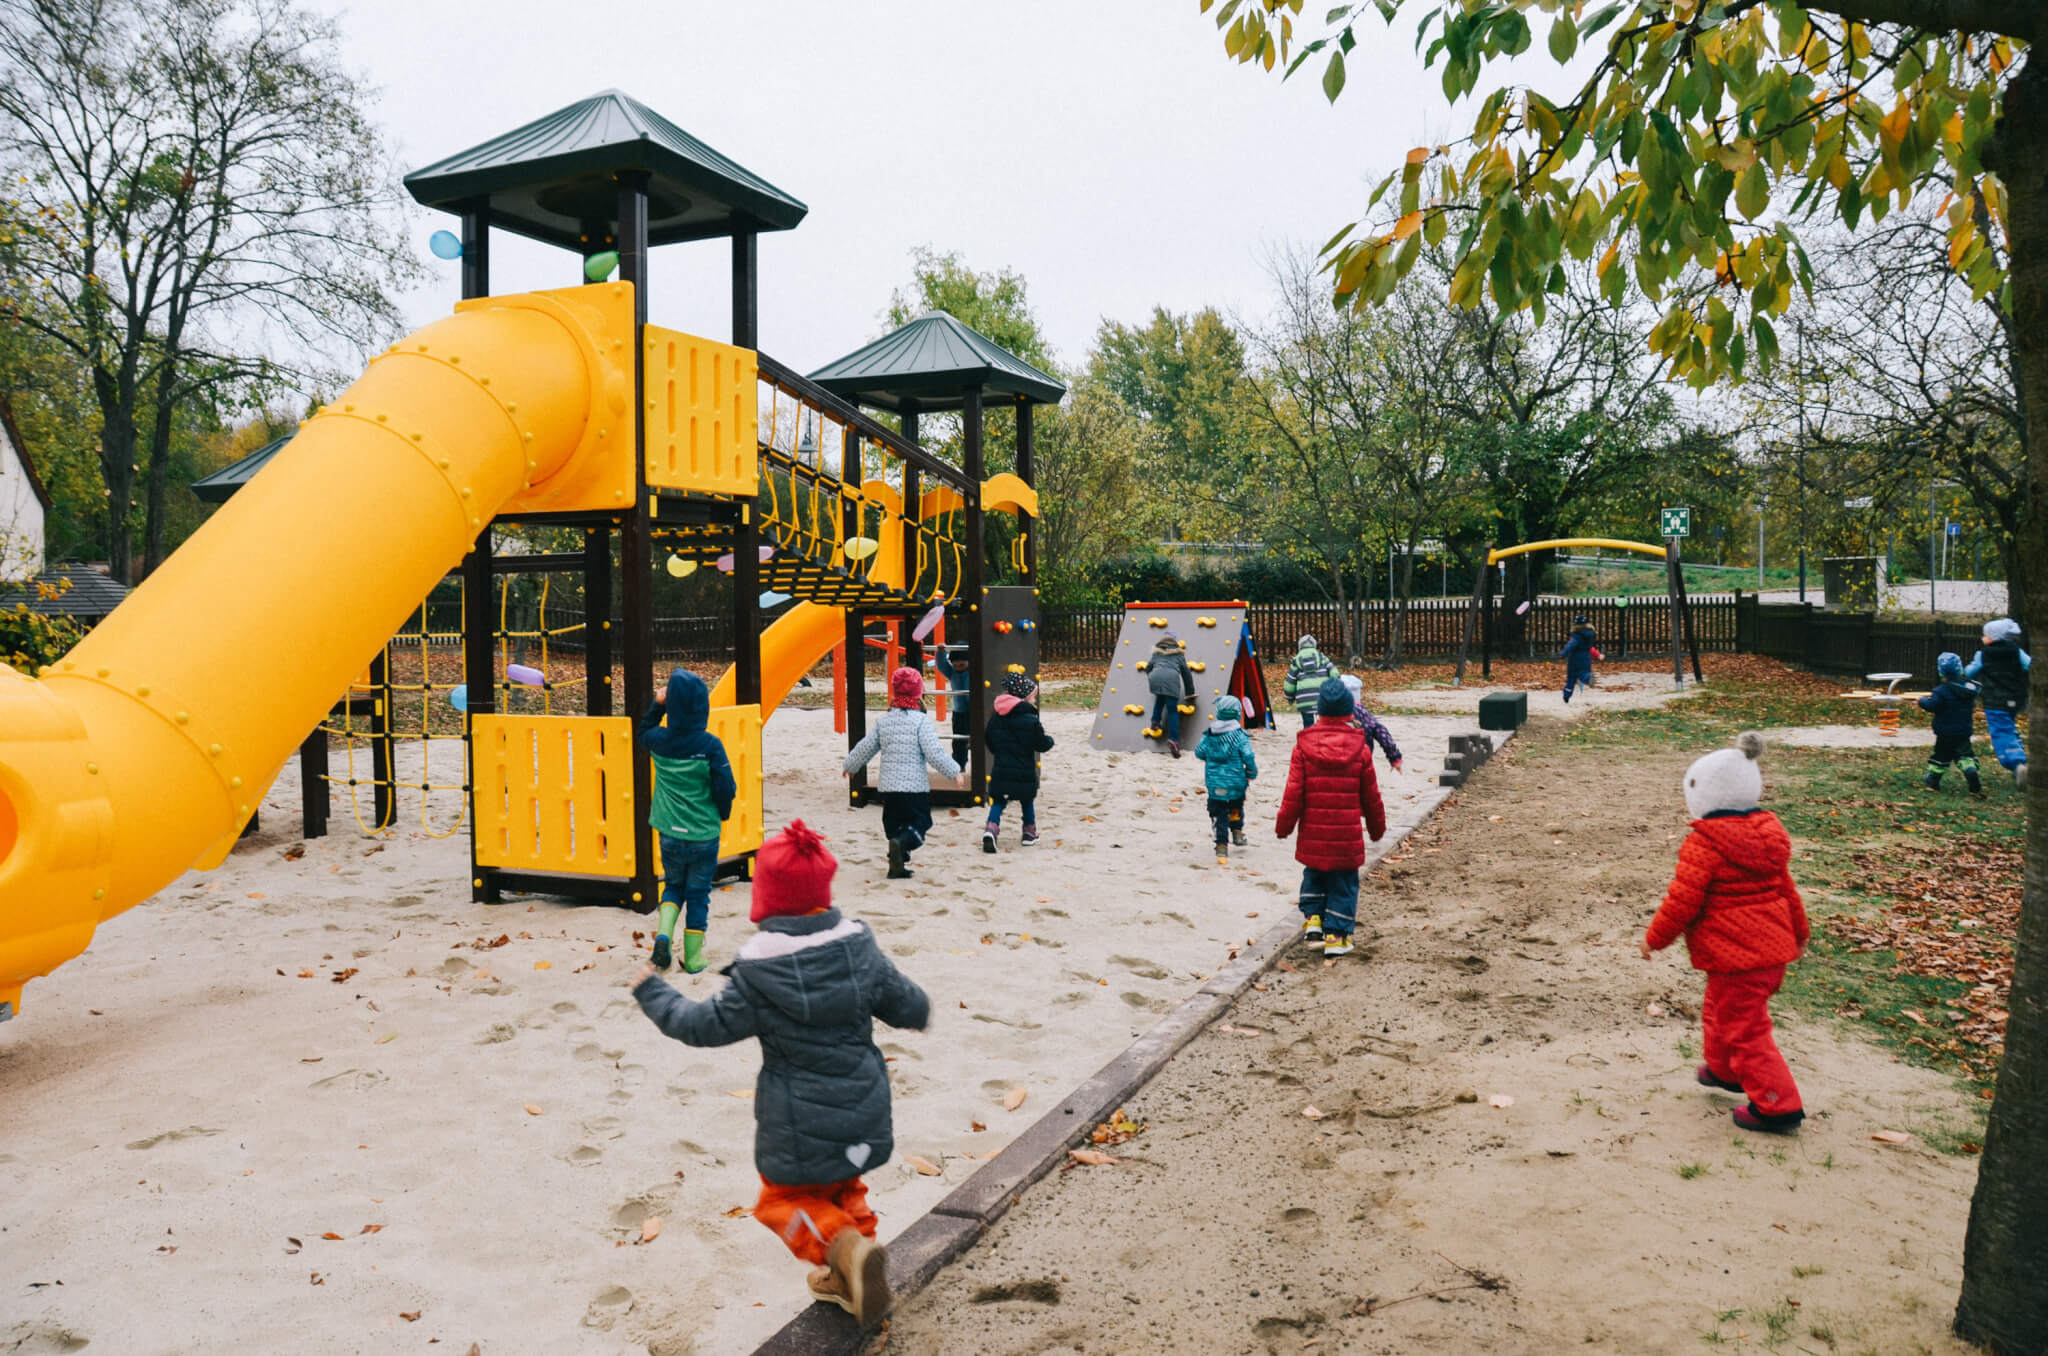 Kita Kinder Spielplatz